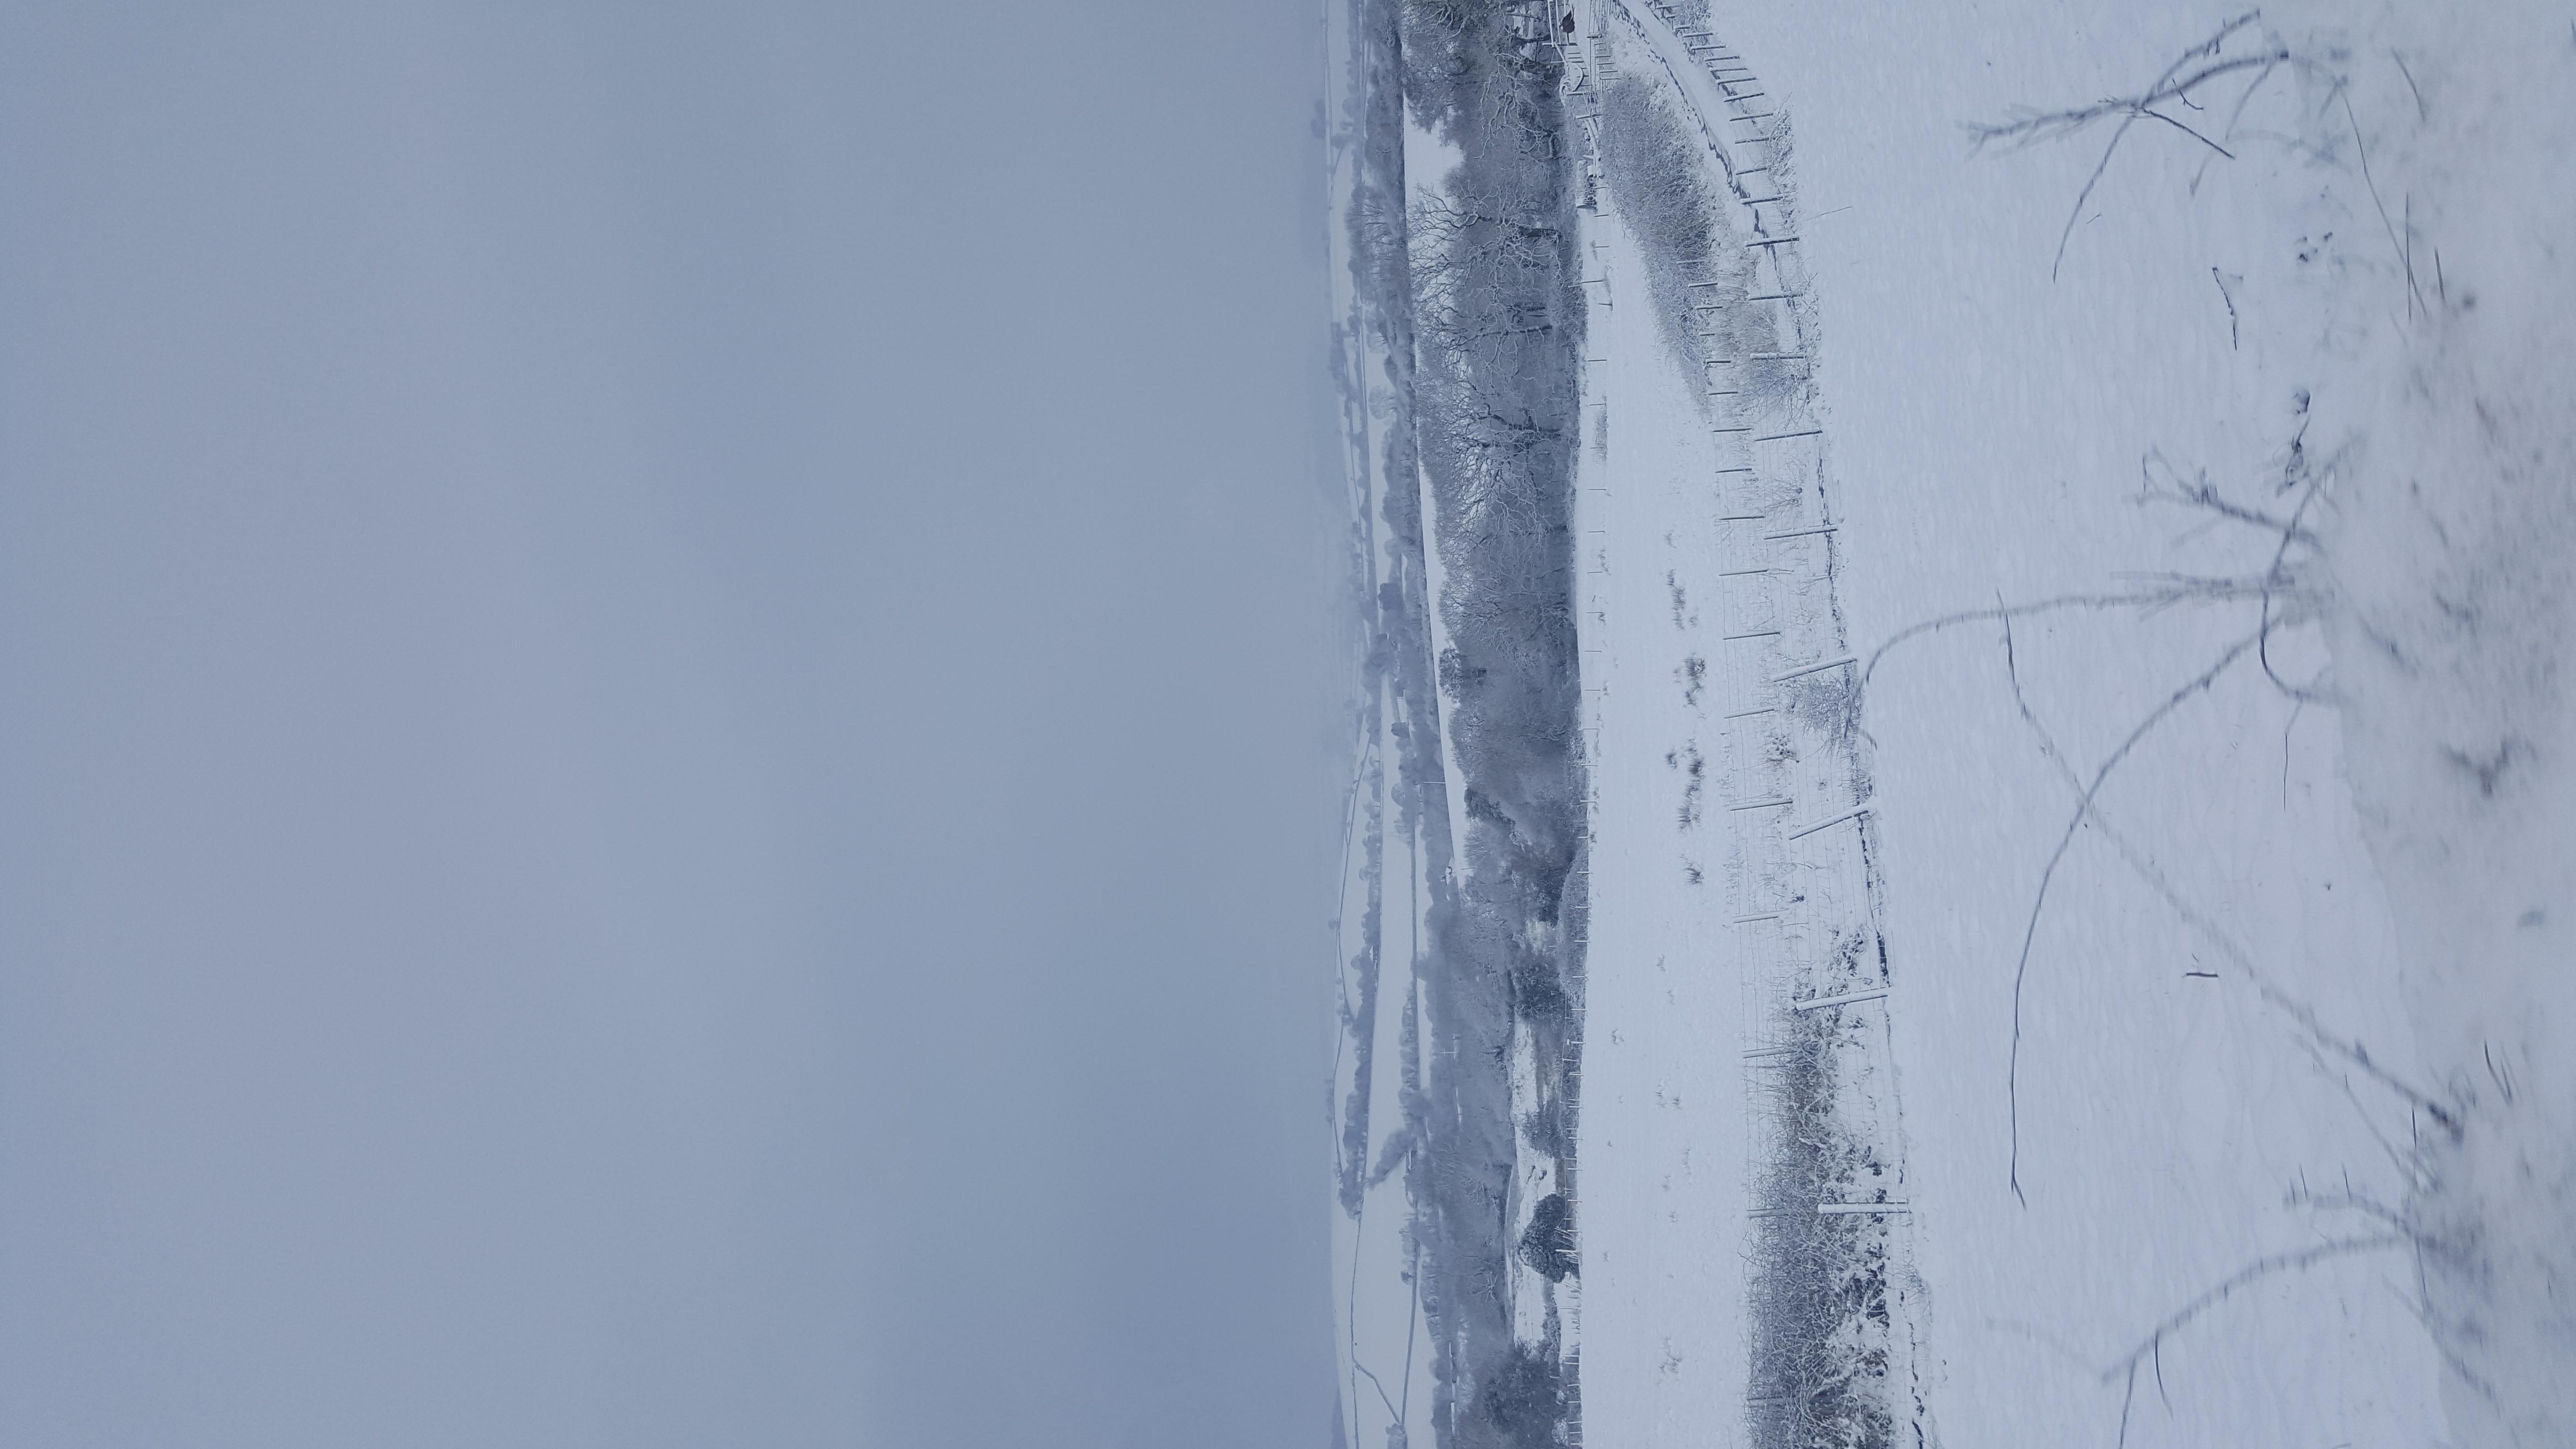 Cornish Snow Fall